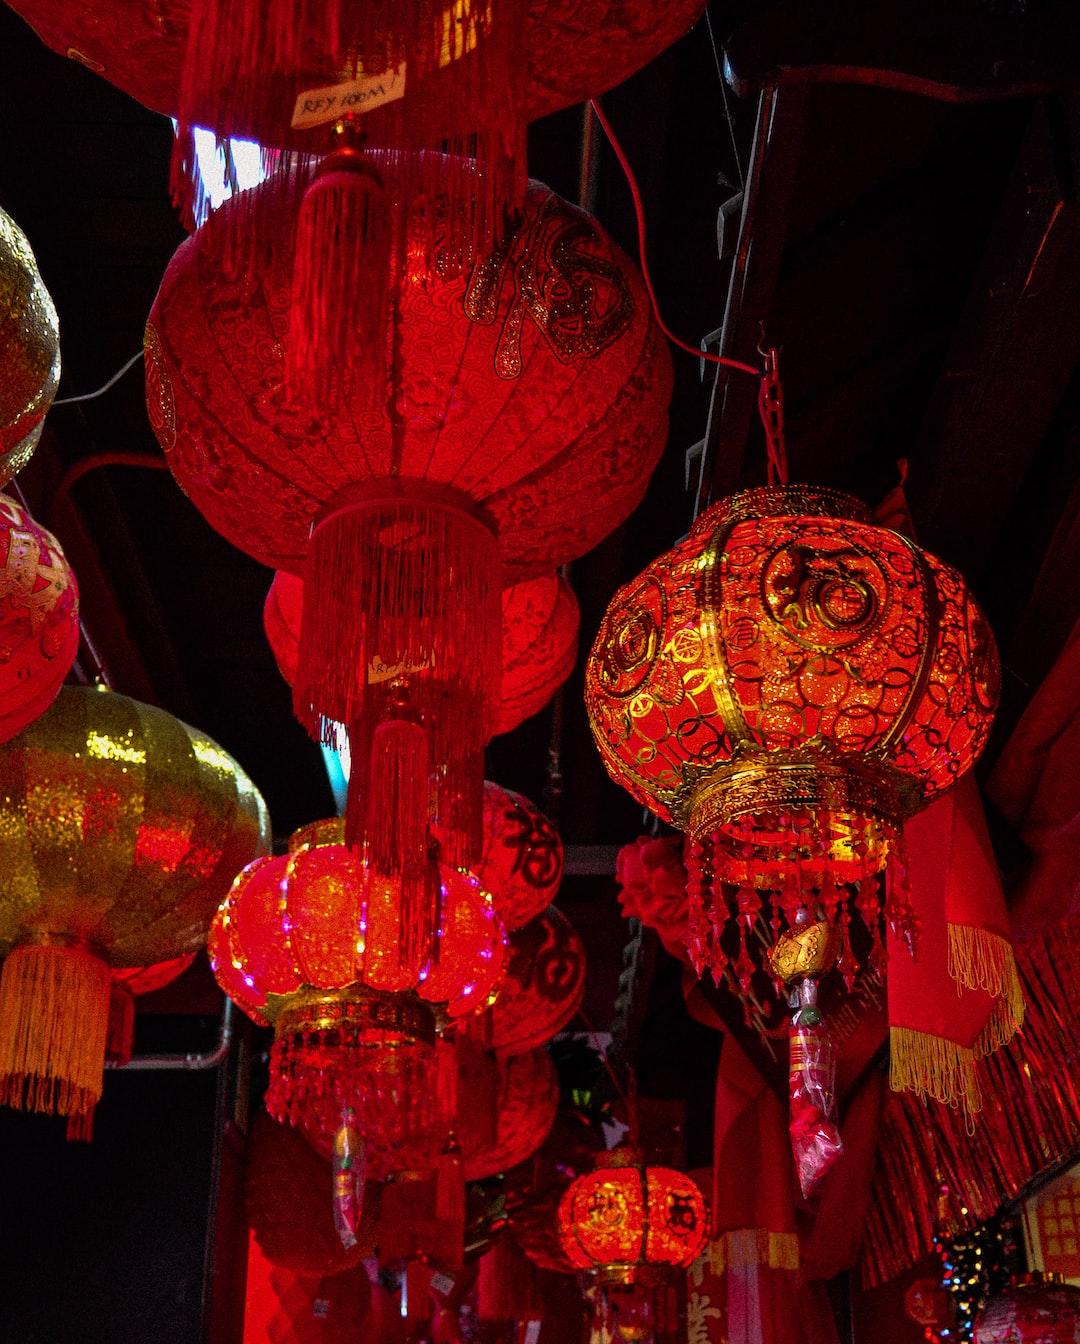 Red and gold celebration lanterns